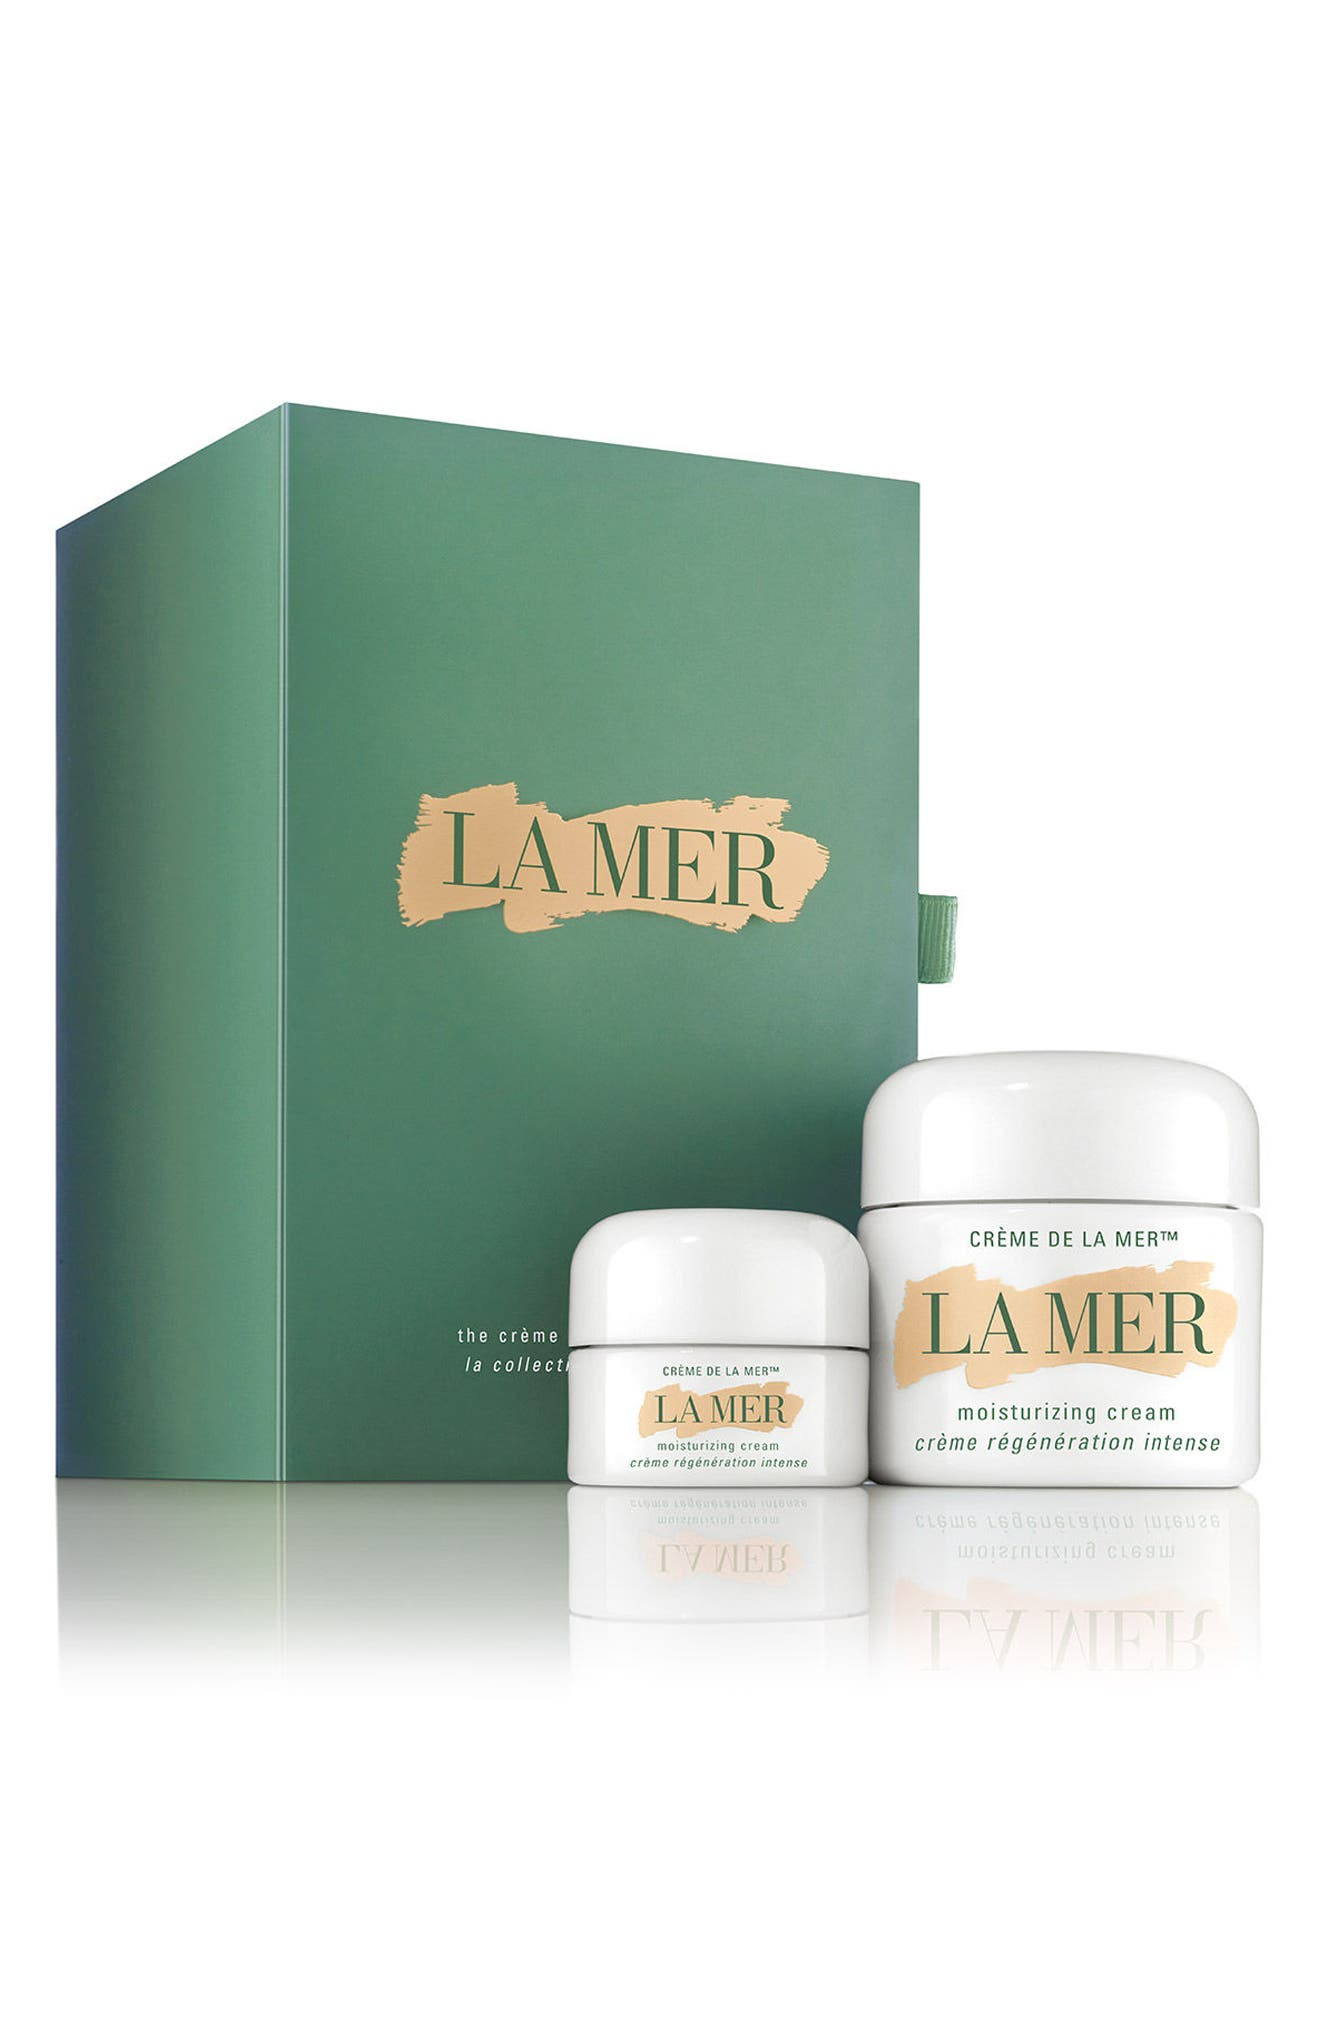 La Mer The Crème de la Mer Collection (Limited Edition) ($387 Value)